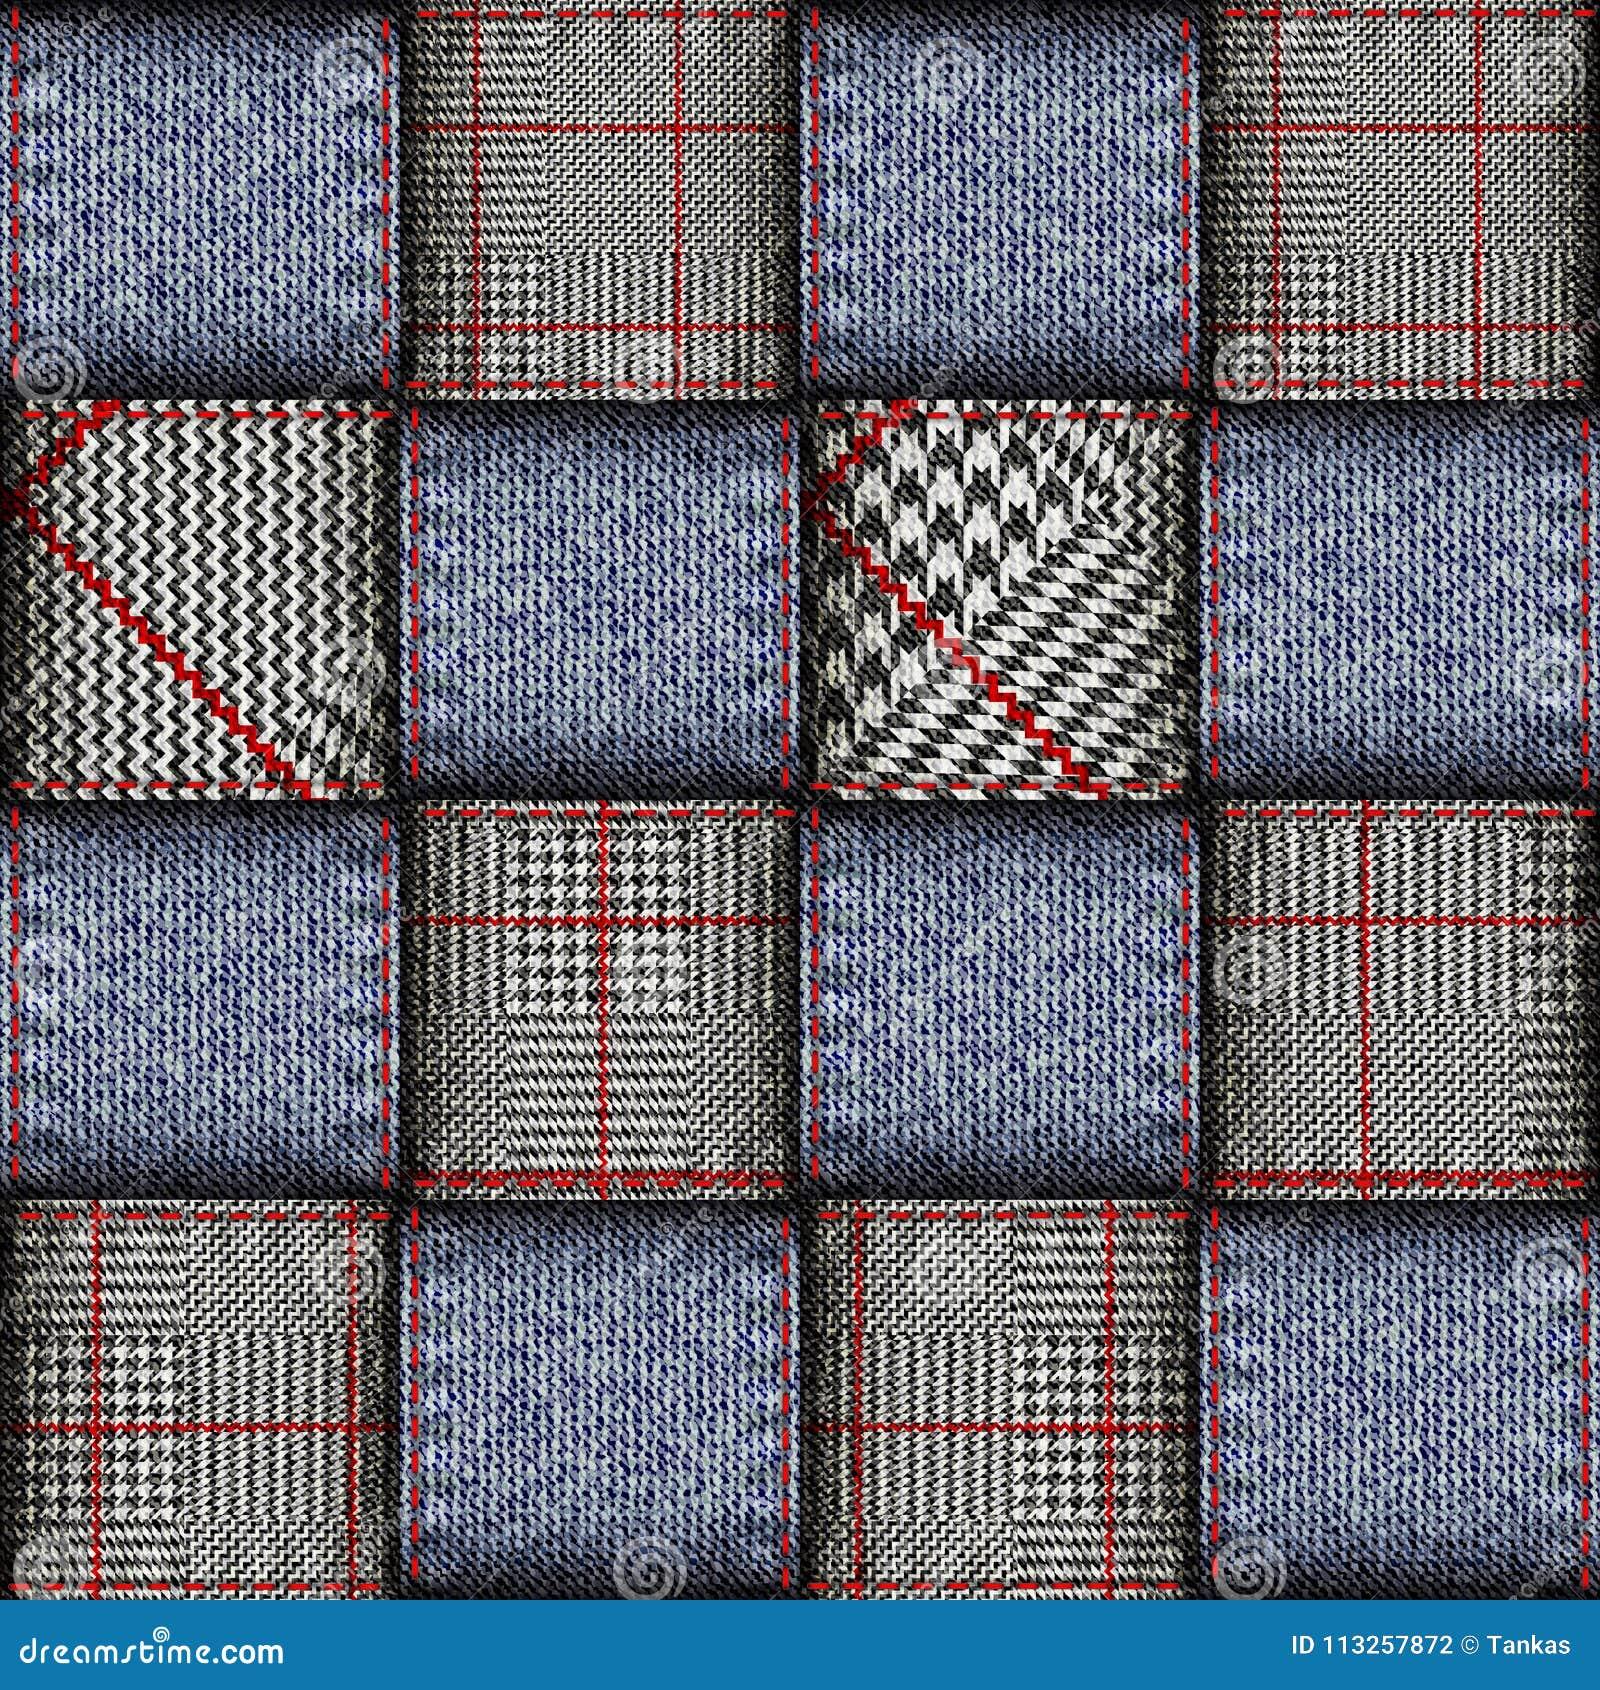 Glen Plaid pattern.